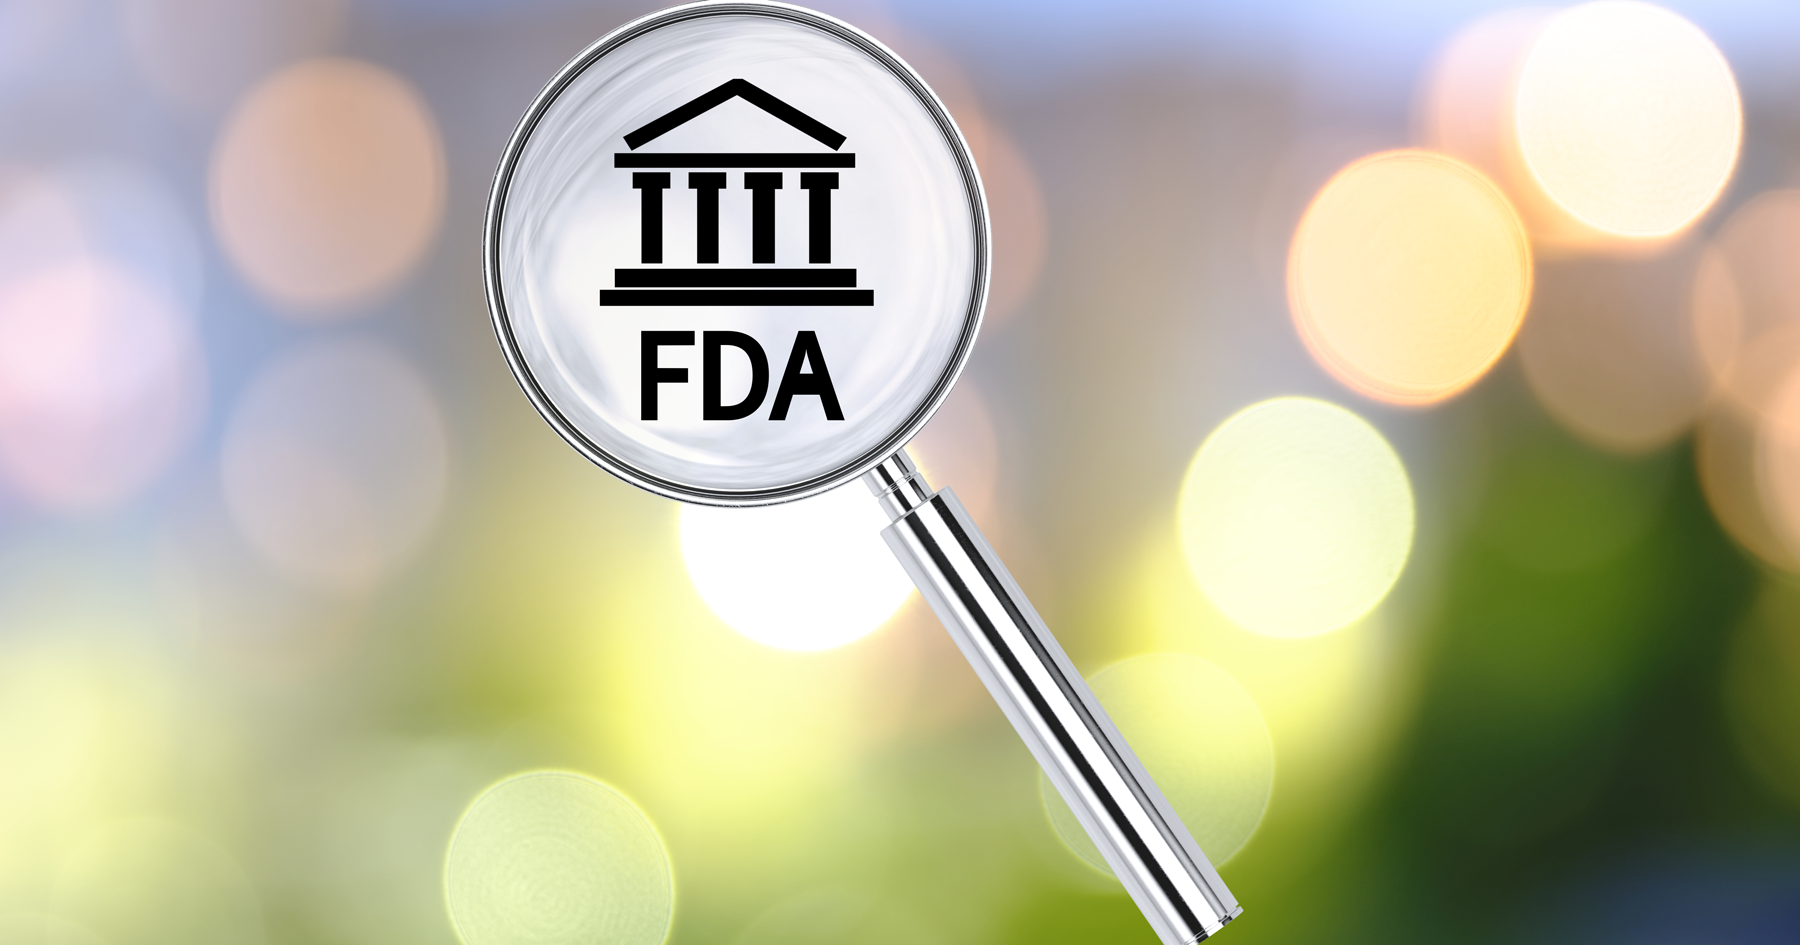 fda magnifying glass